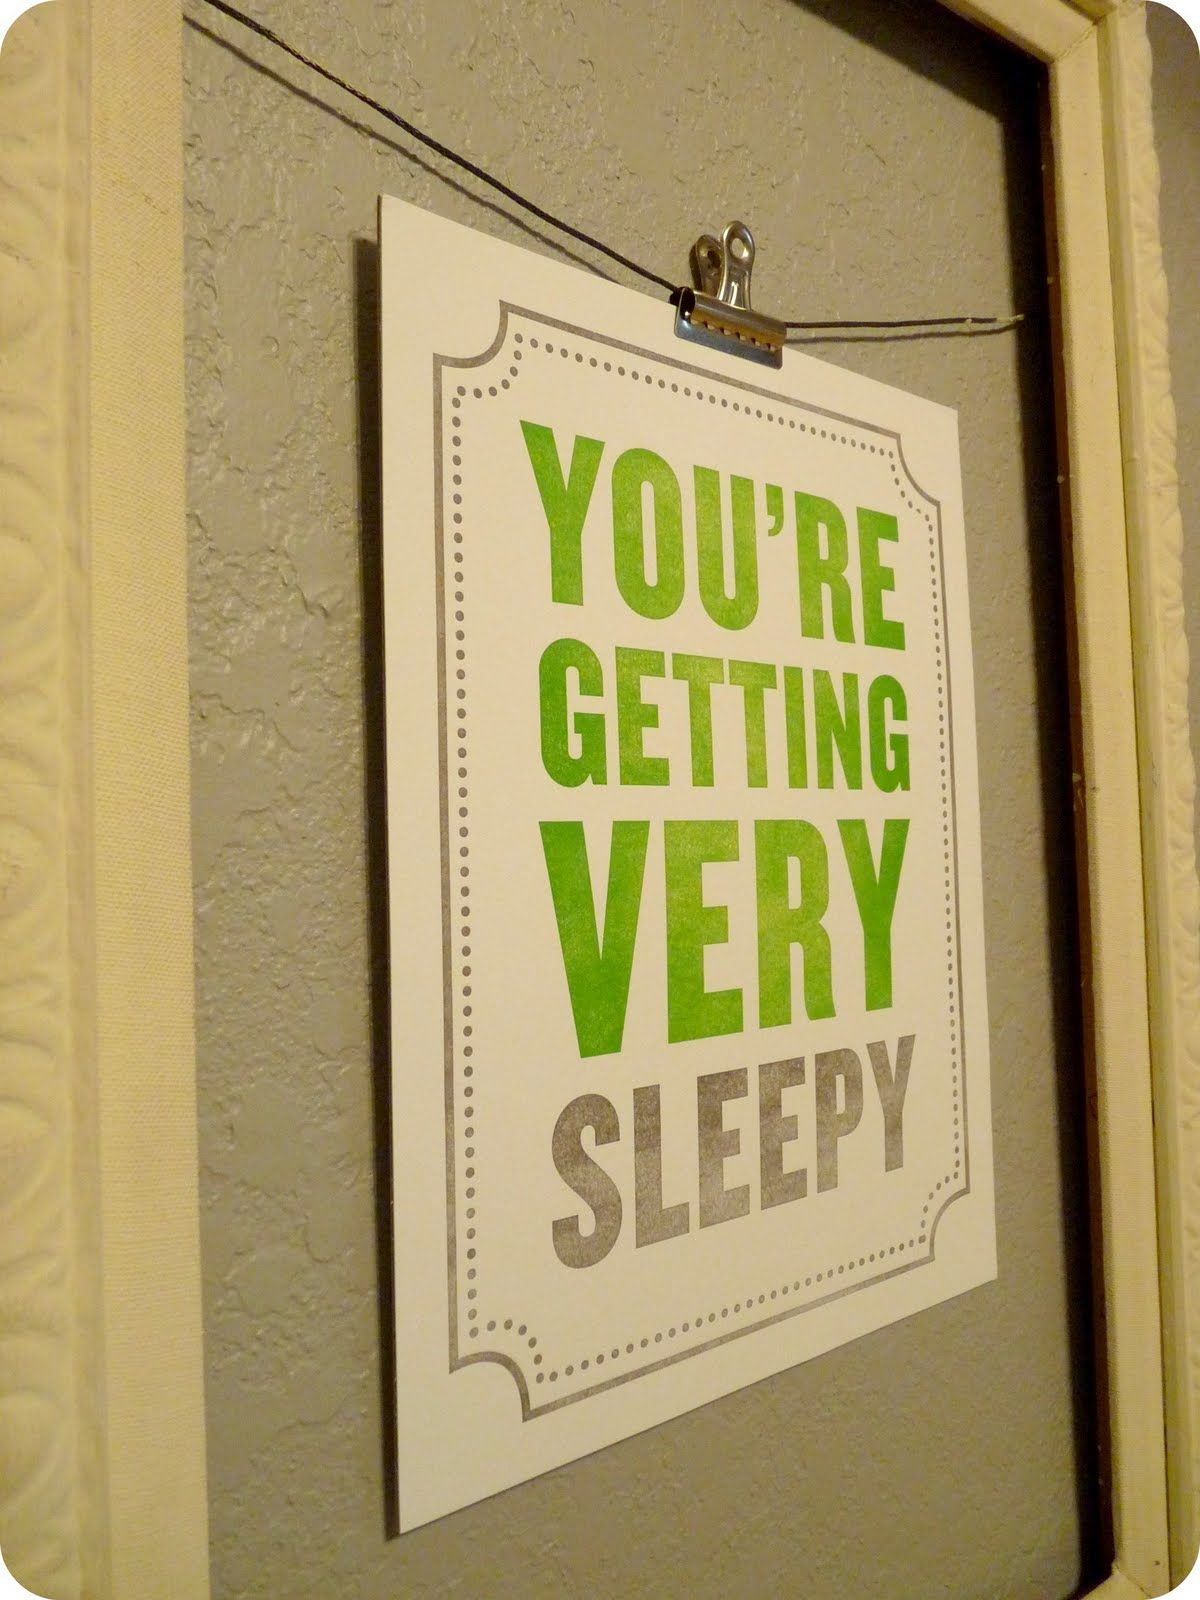 cool print/framing idea   boys bedrooms   Pinterest   Wall ideas ...